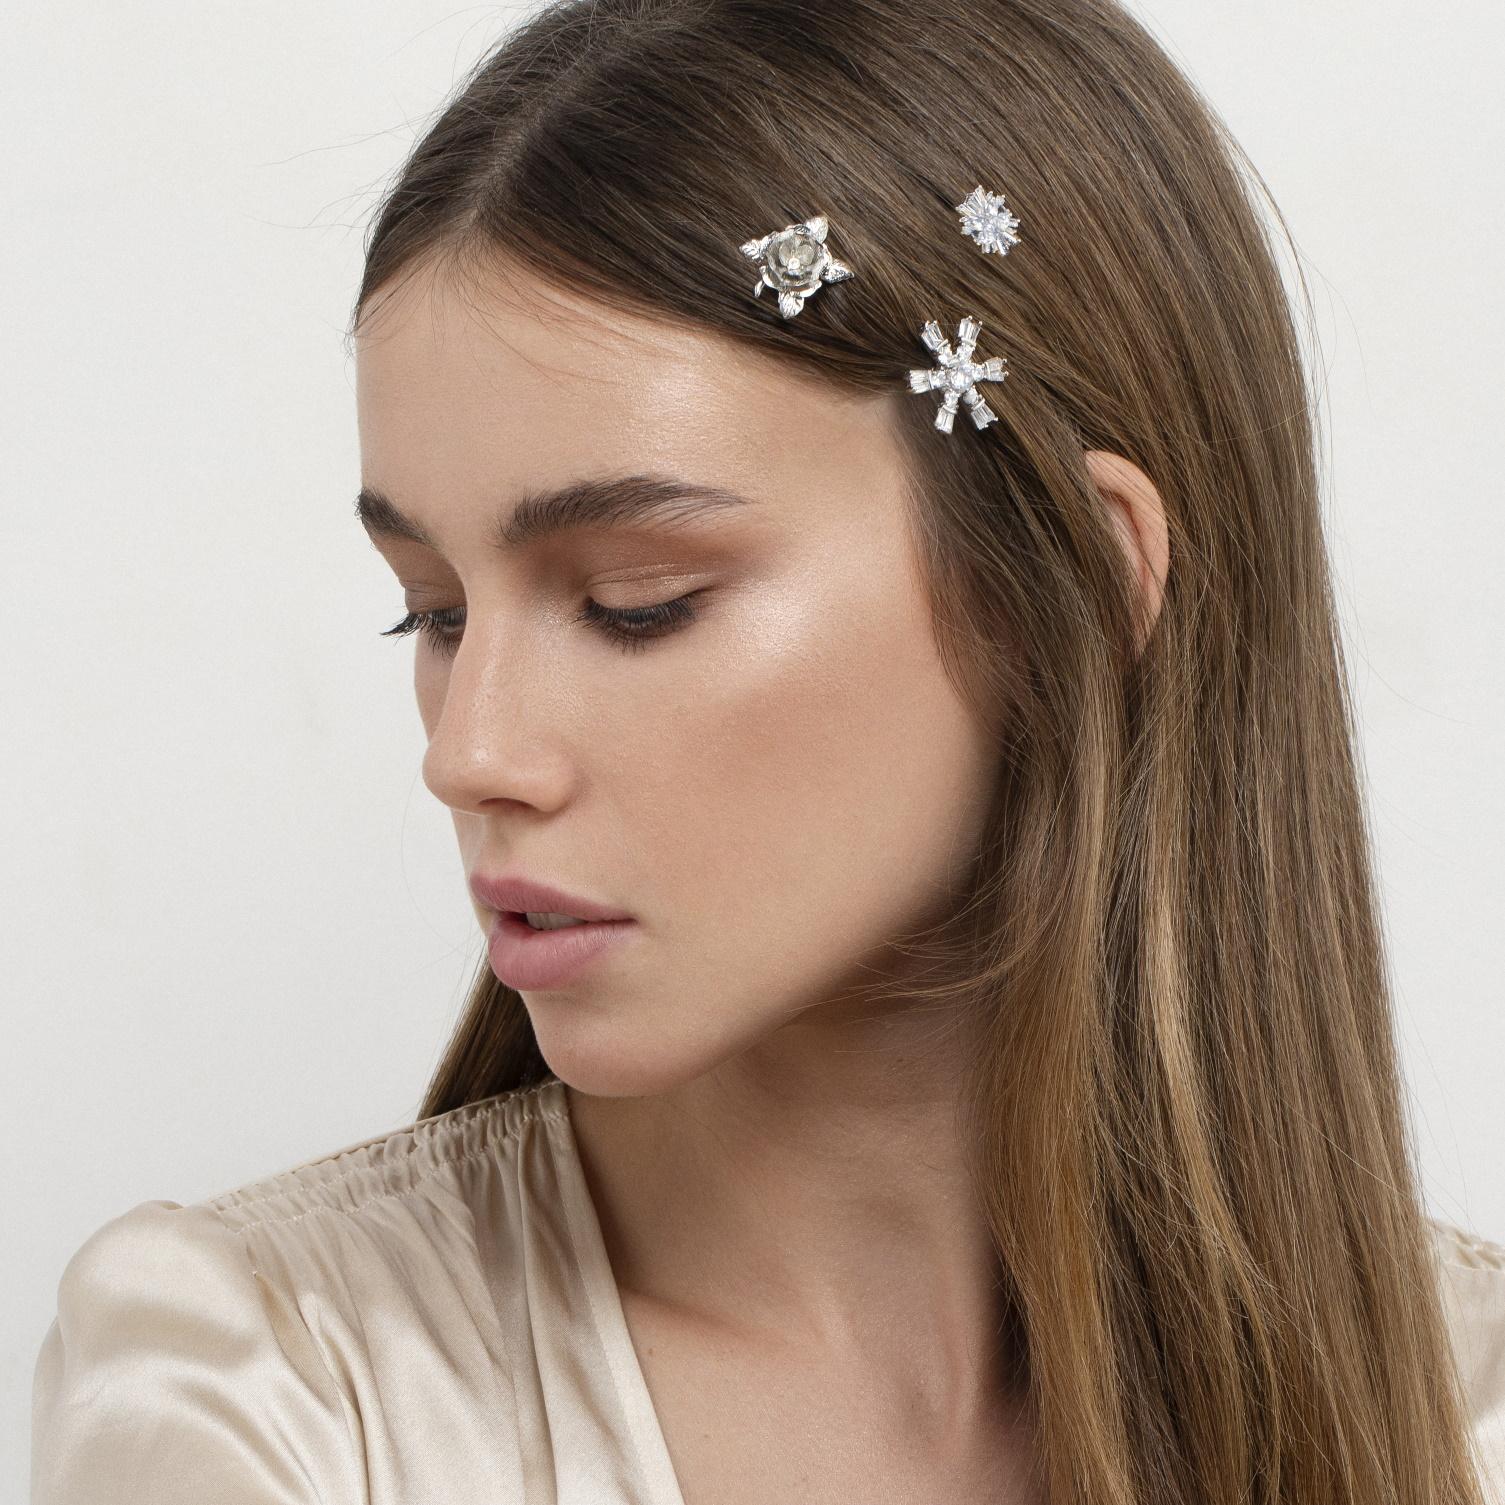 Star Hair Studs